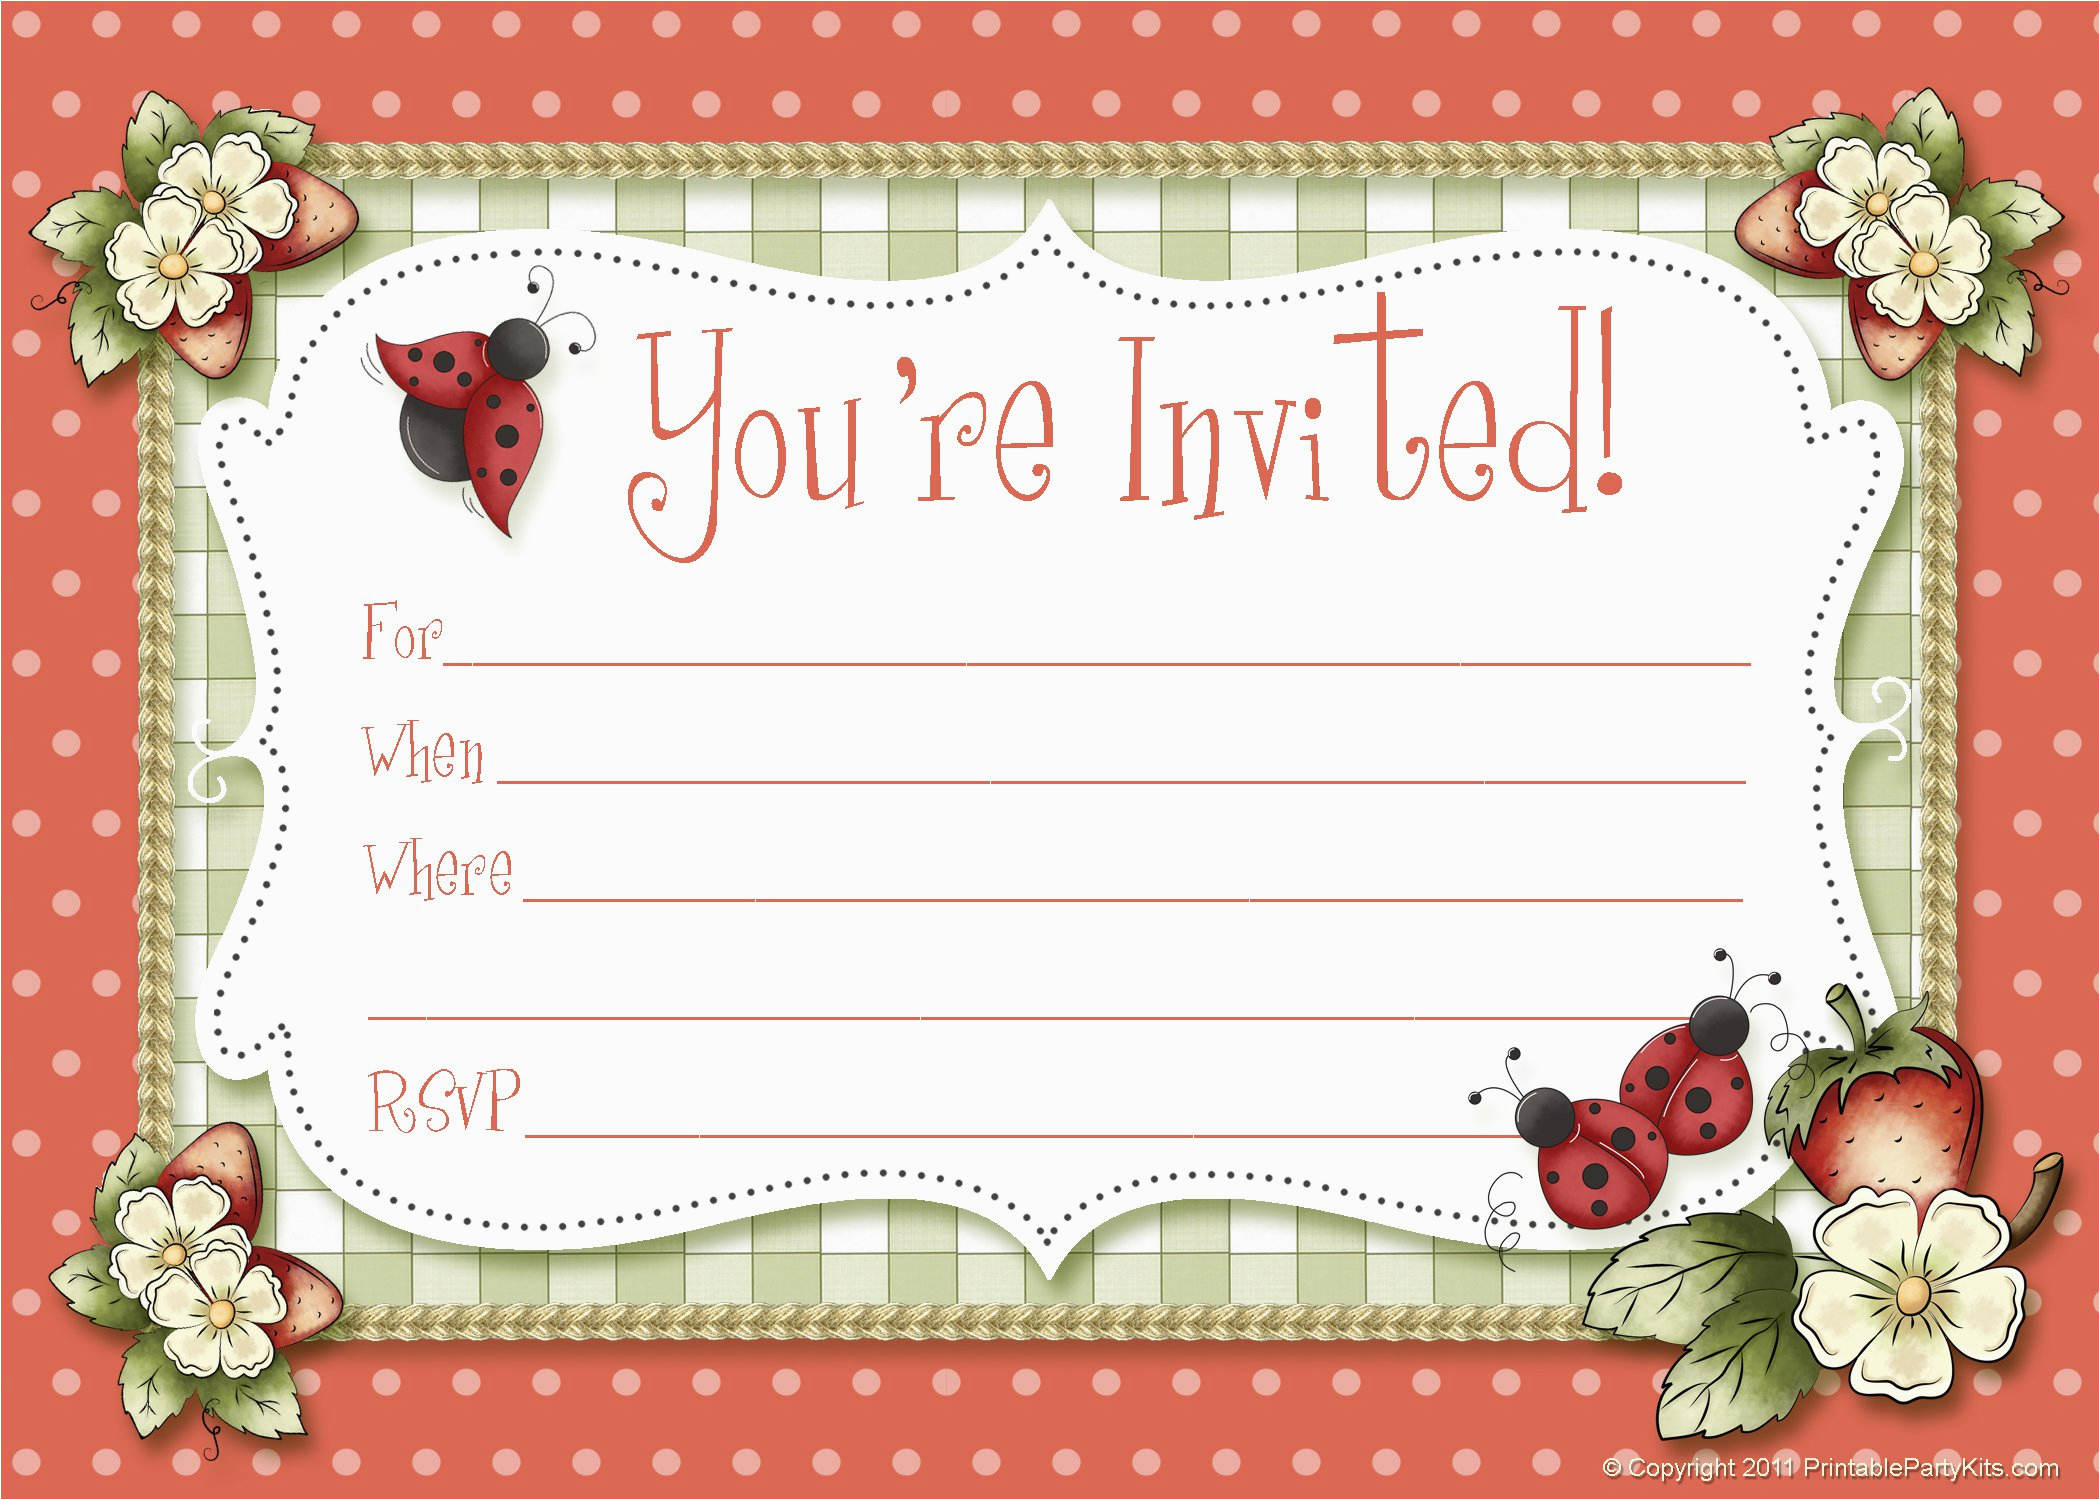 Make Birthday Invitation Cards Online For Free Printable | Birthdaybuzz - Make Your Own Printable Birthday Cards Online Free